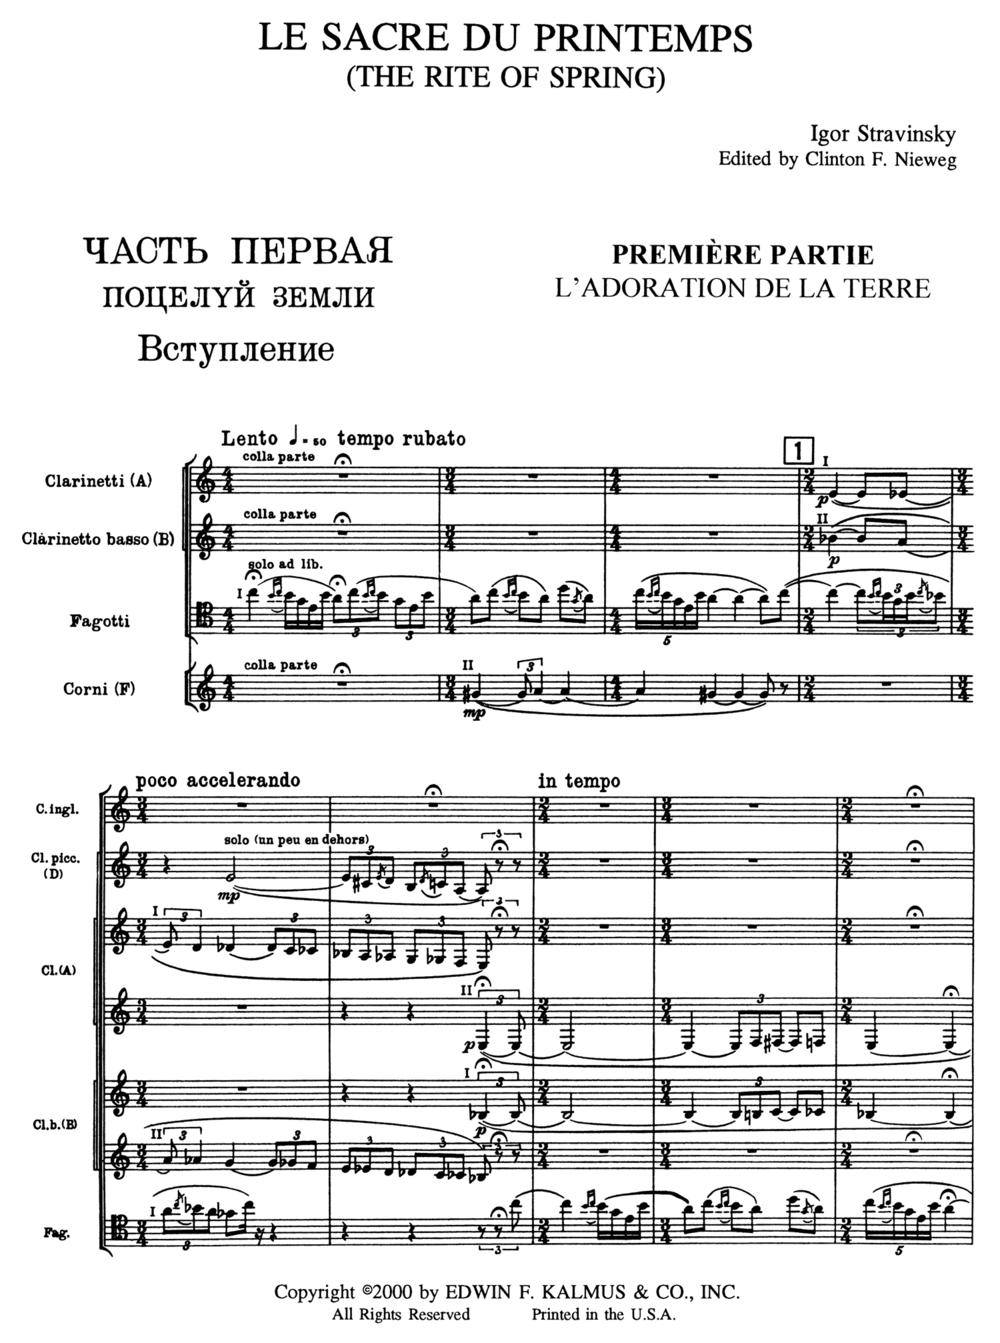 Rite of Spring Score Page 1.jpg